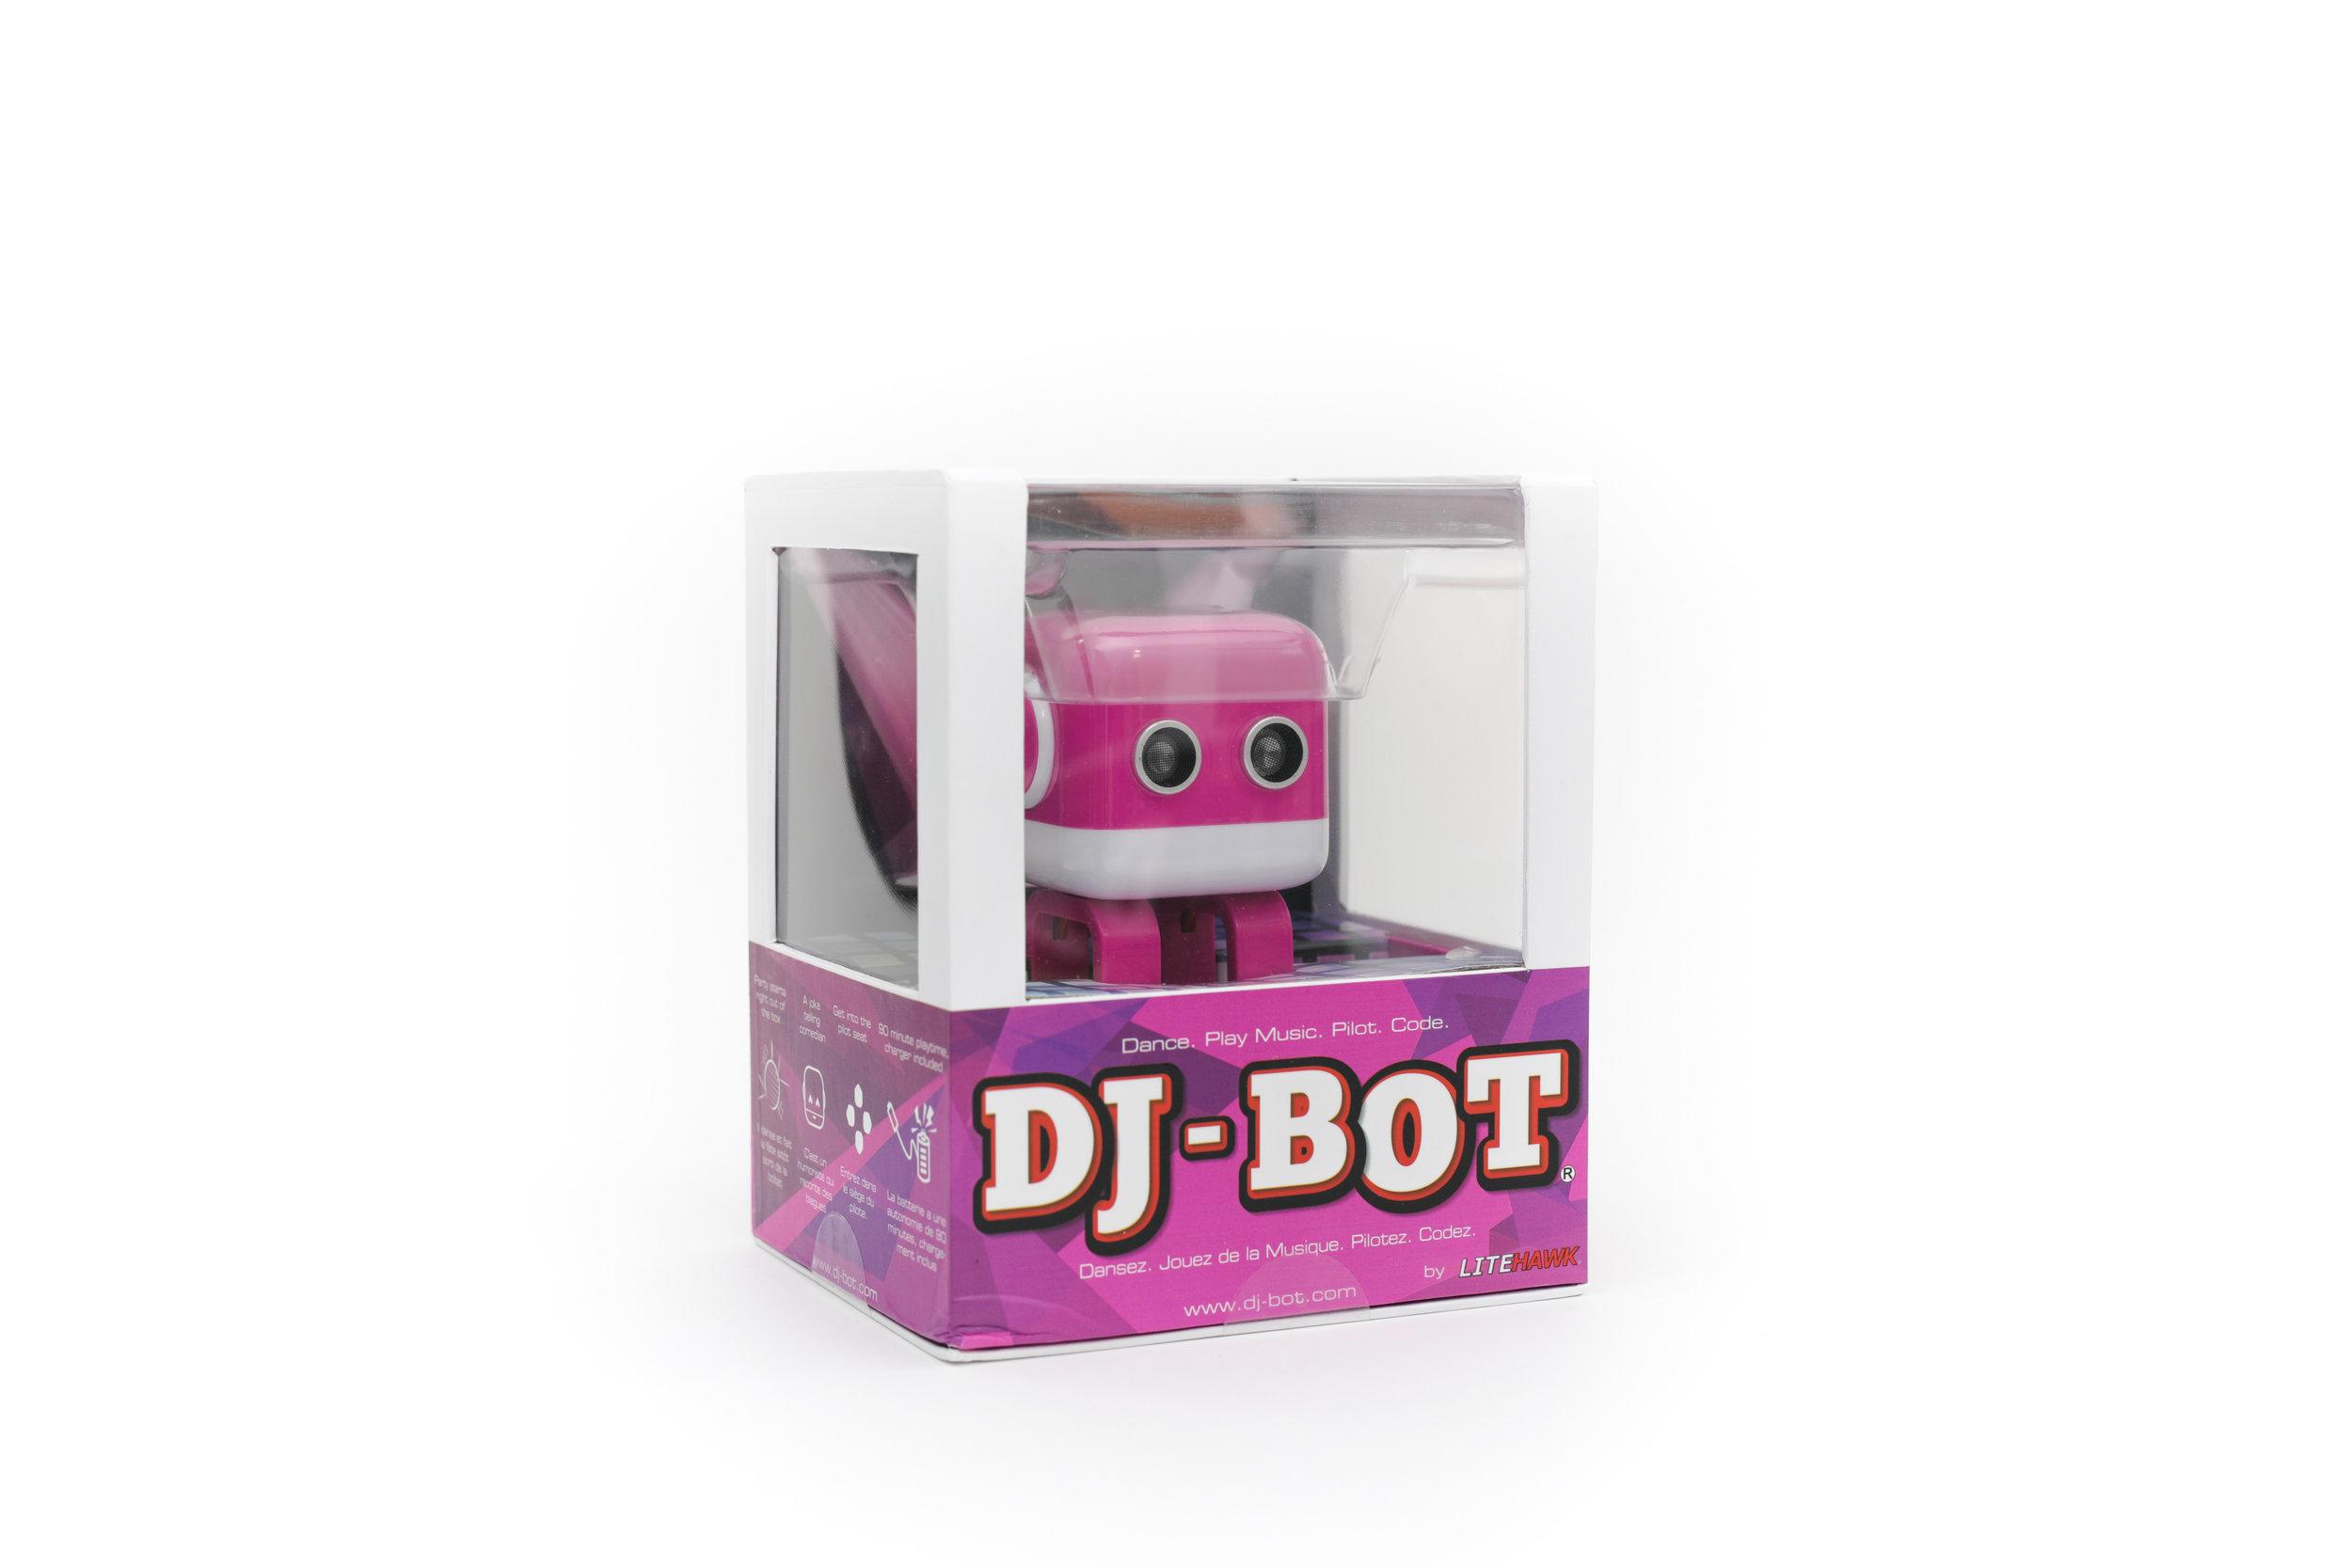 DJ BOT Box (3 of 6).jpg